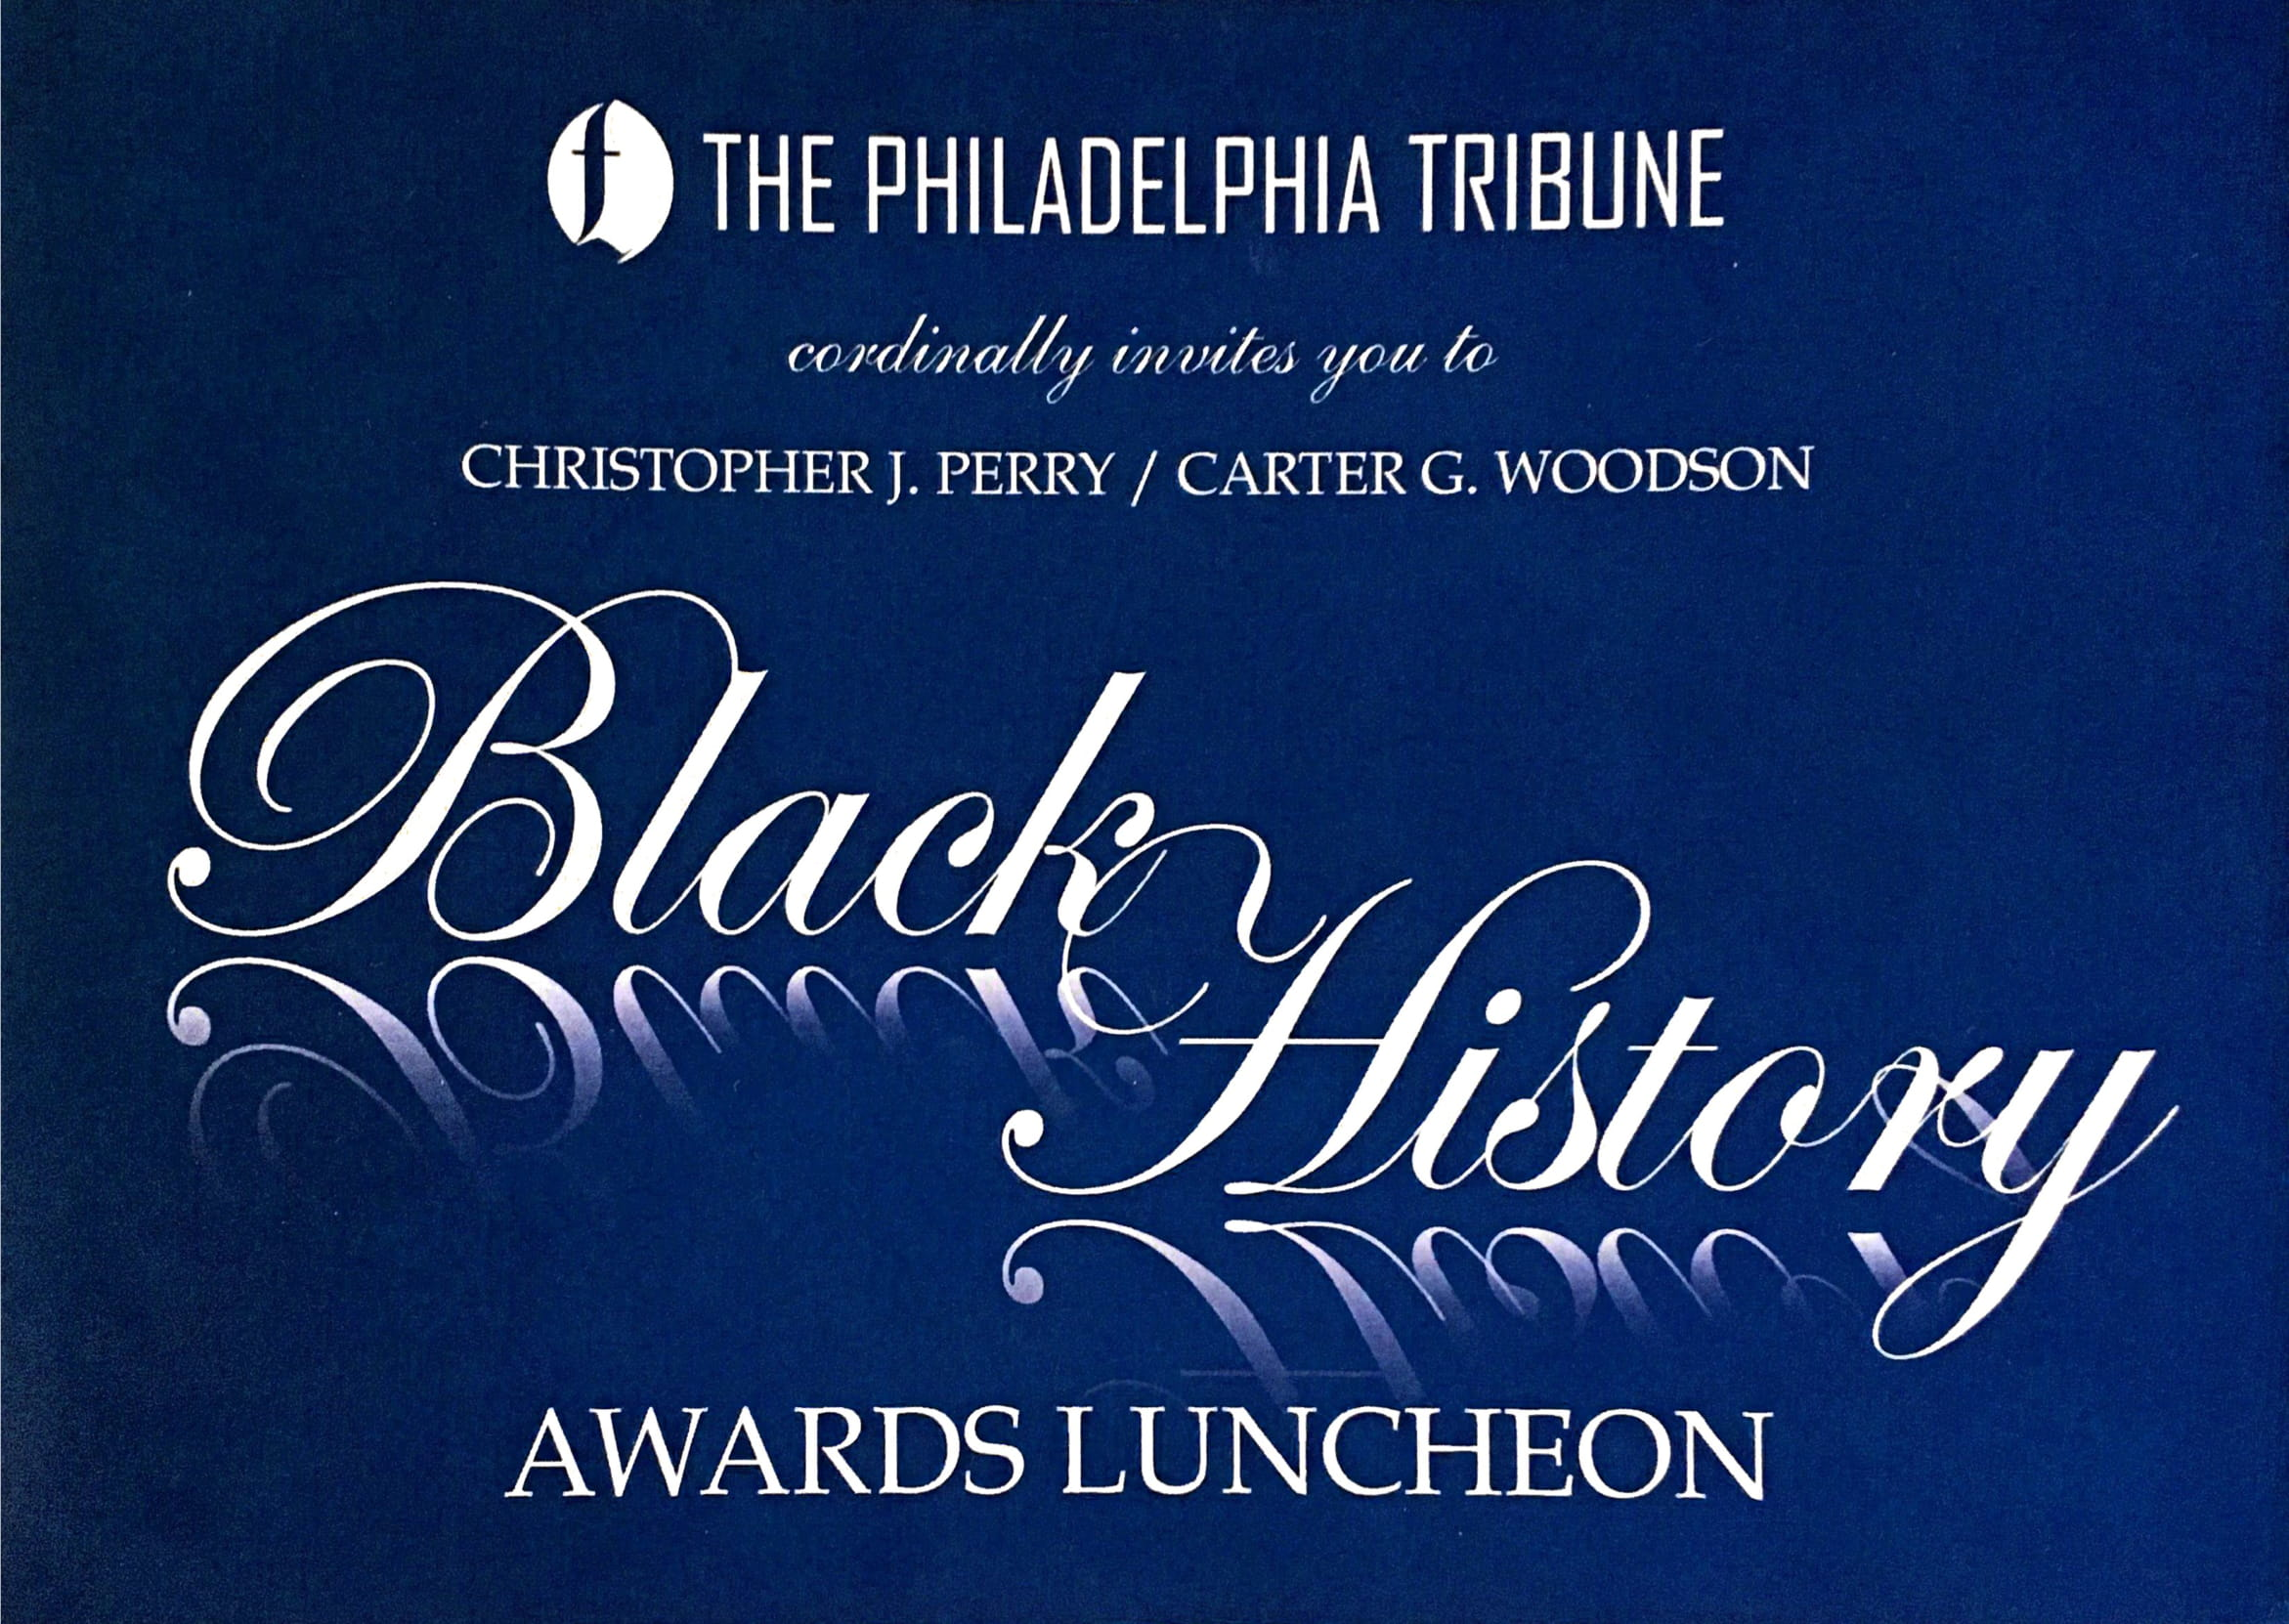 Black History Awards Luncheon